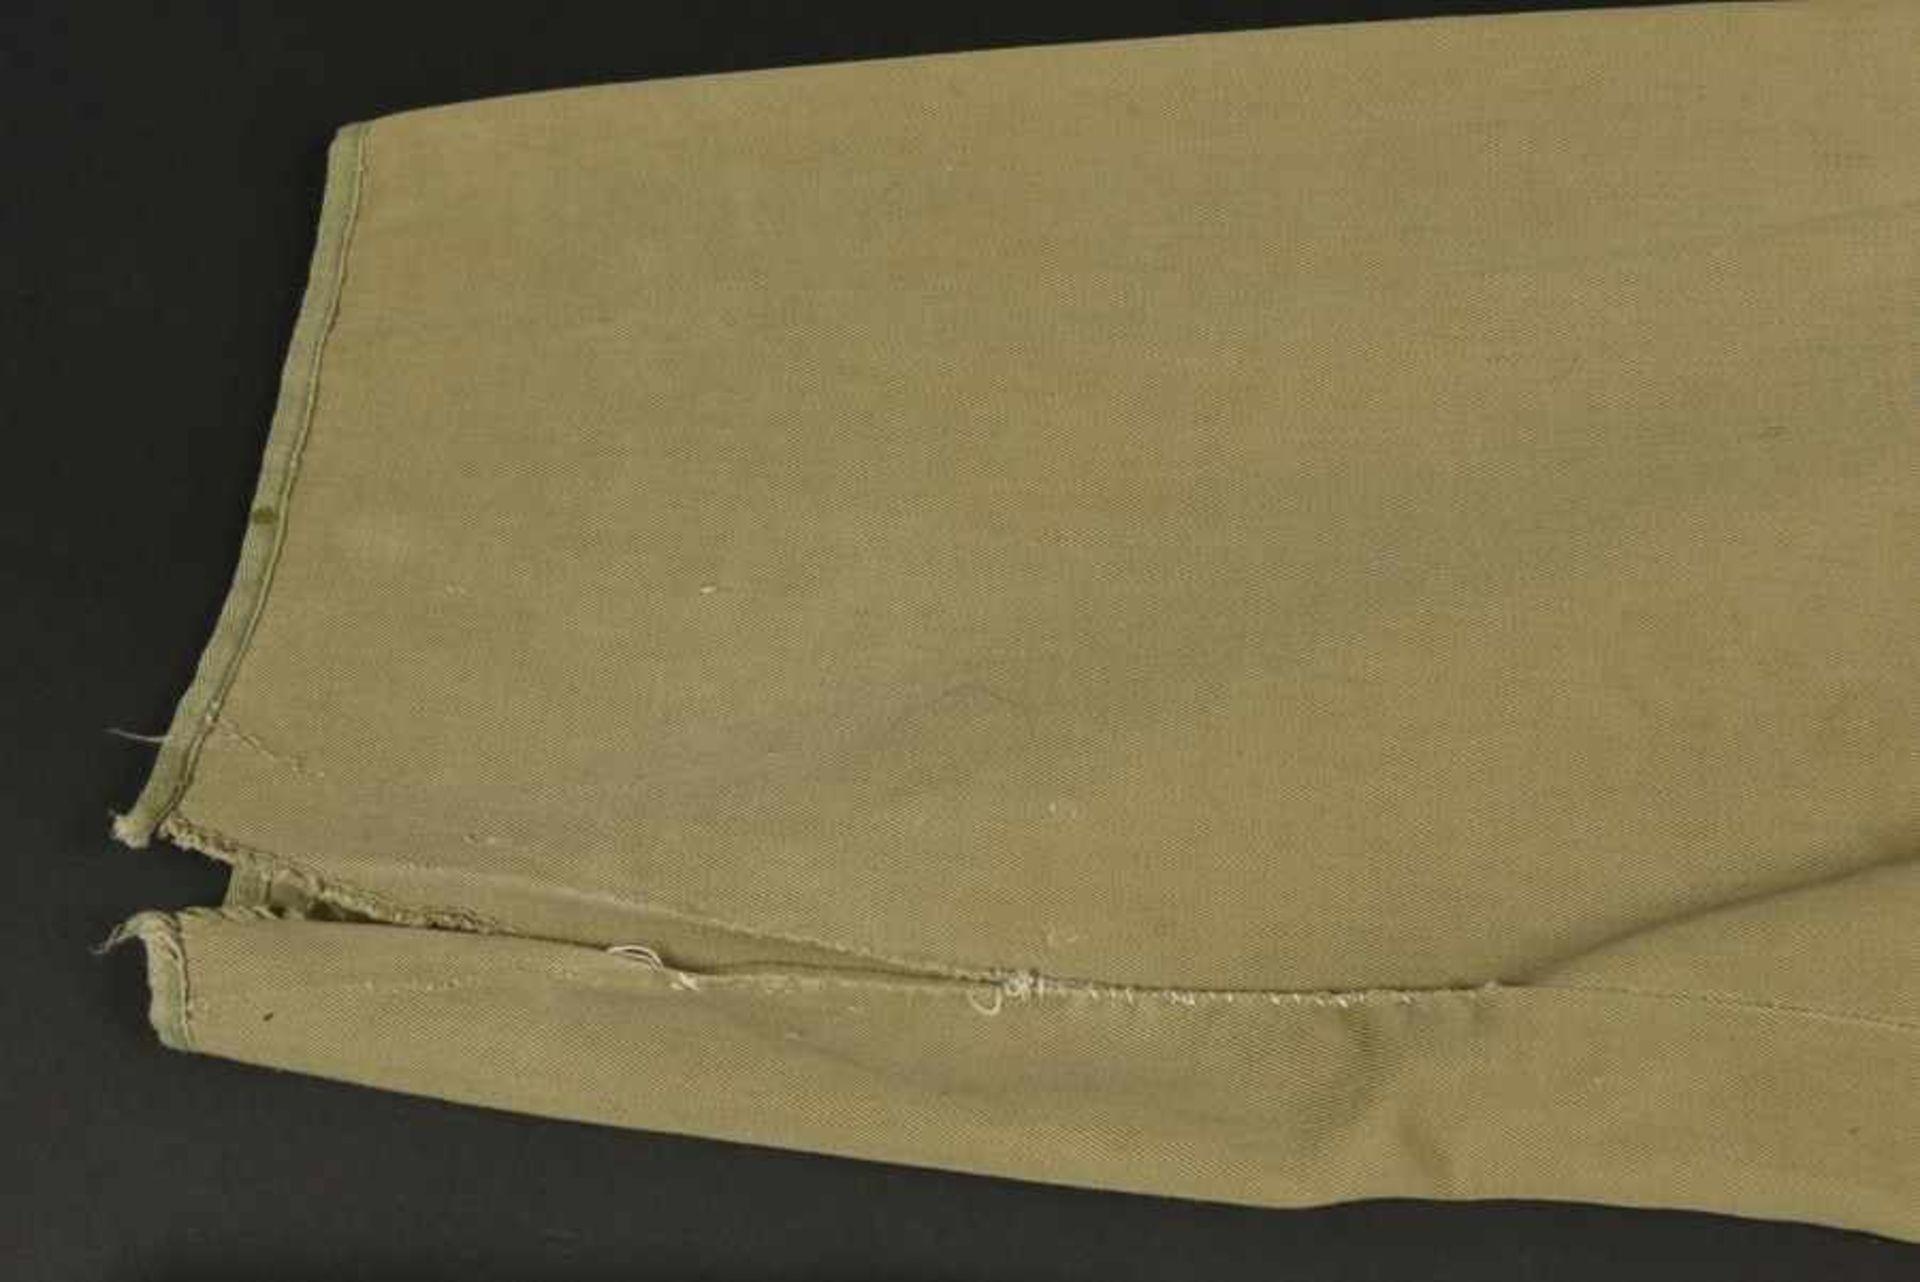 Pantalon du parachutiste américain B Orsborn. Pants of American paratrooper B OrsbornEn popeline, - Bild 3 aus 4